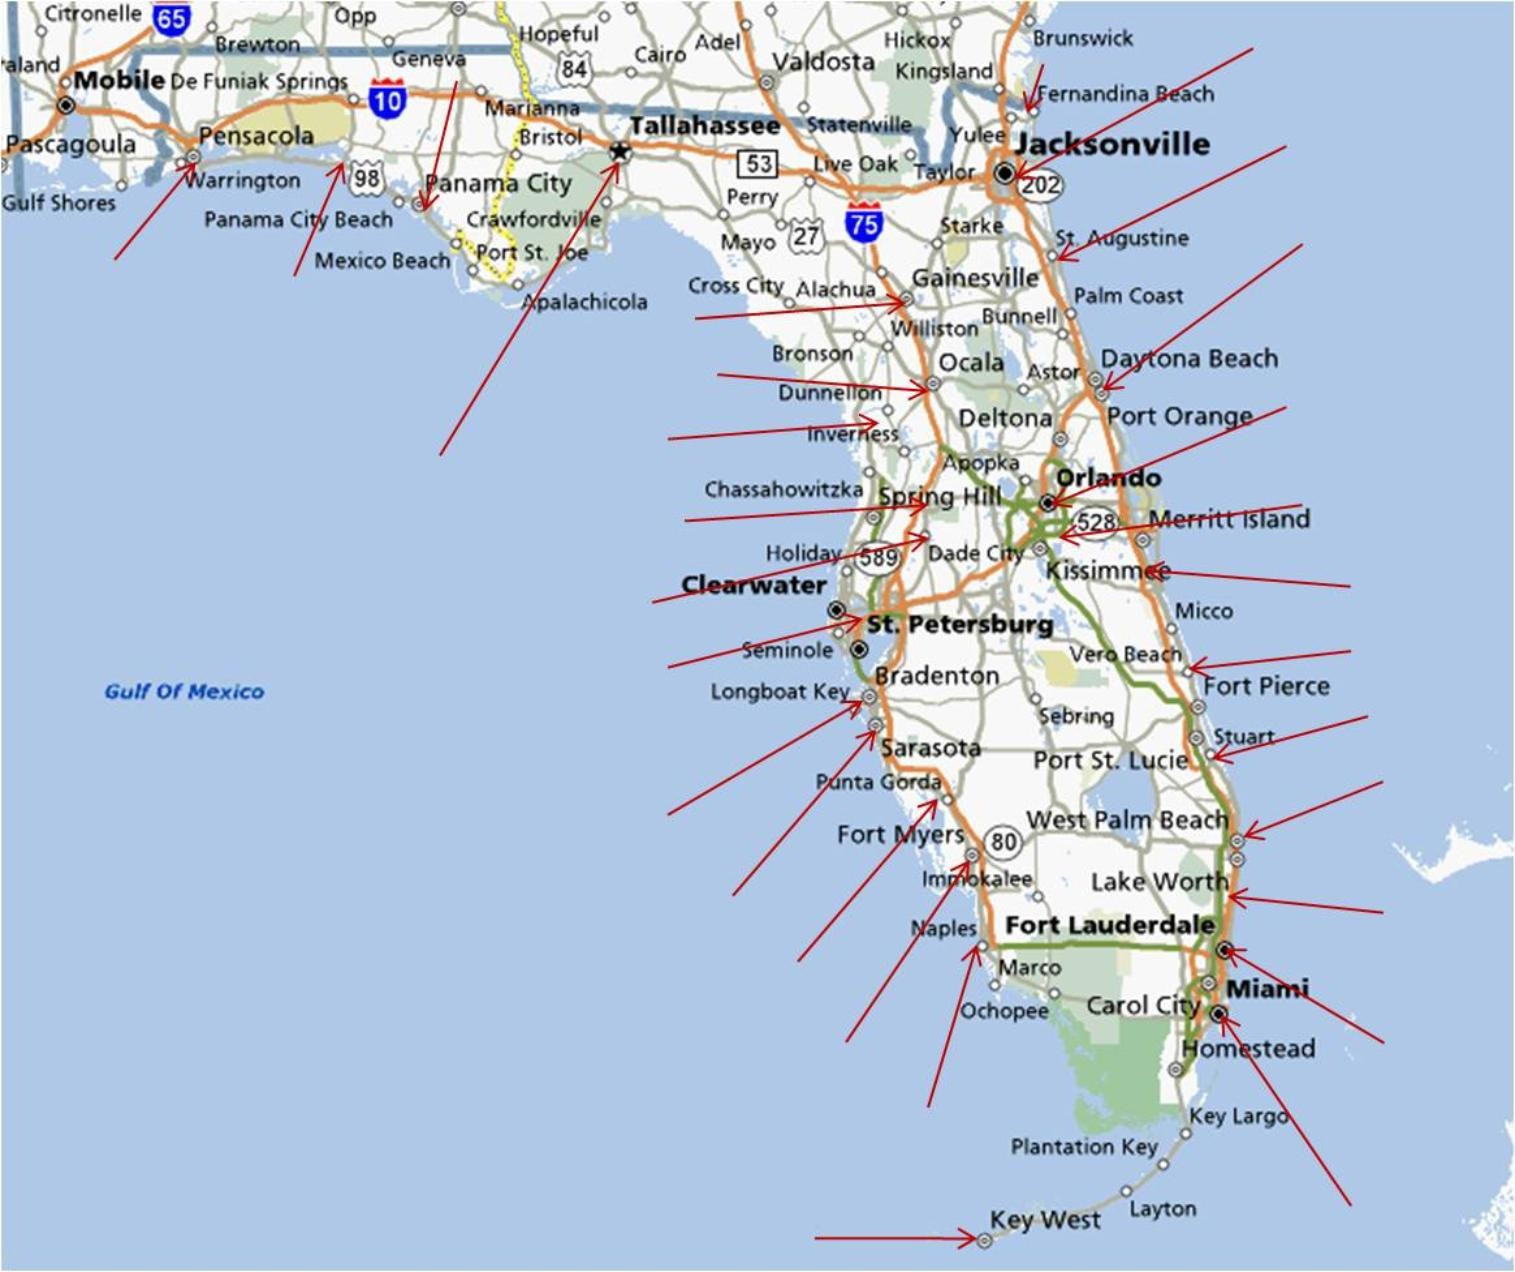 Mexico Beach Florida Map From Windsurfaddicts 9 - Judecelestin2010 - Bristol Florida Map